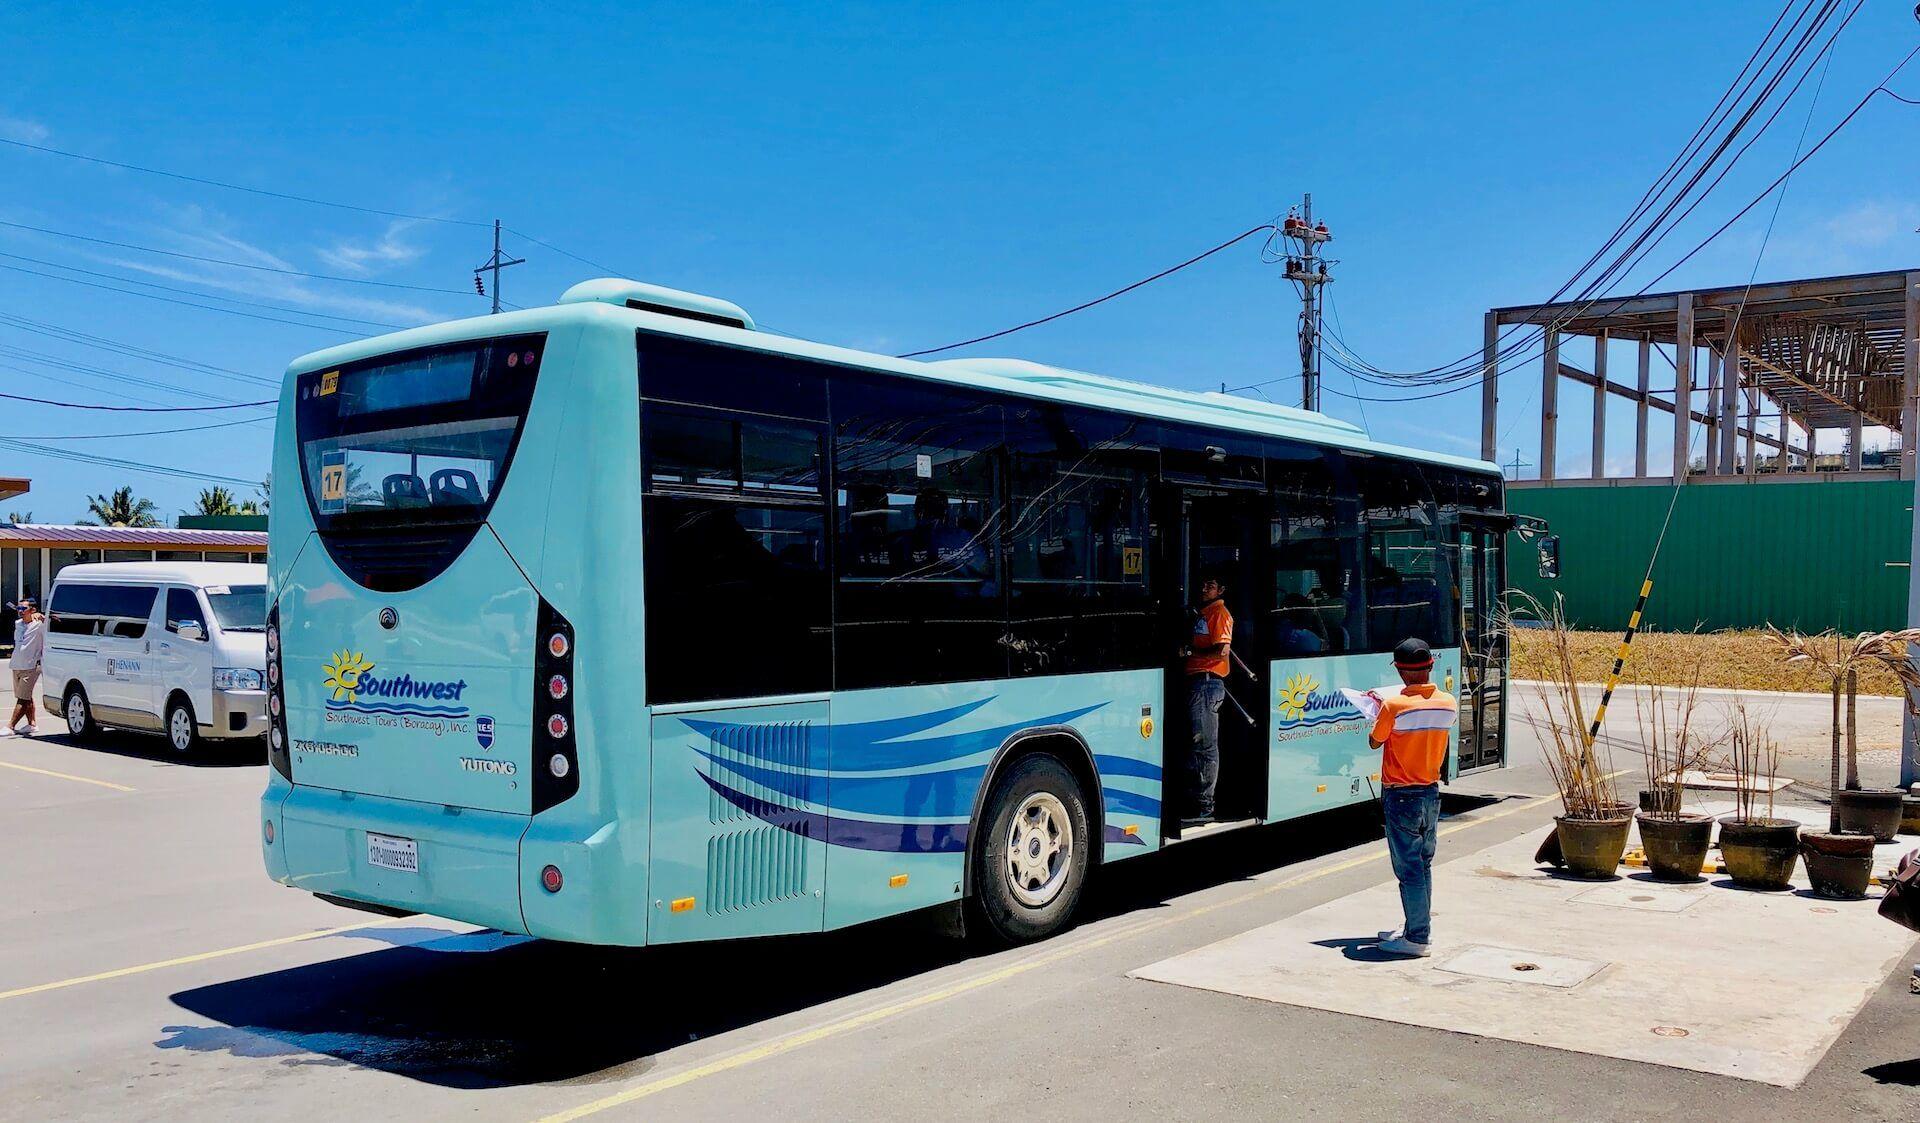 Southwest Airport Bus Caticlan Boracay